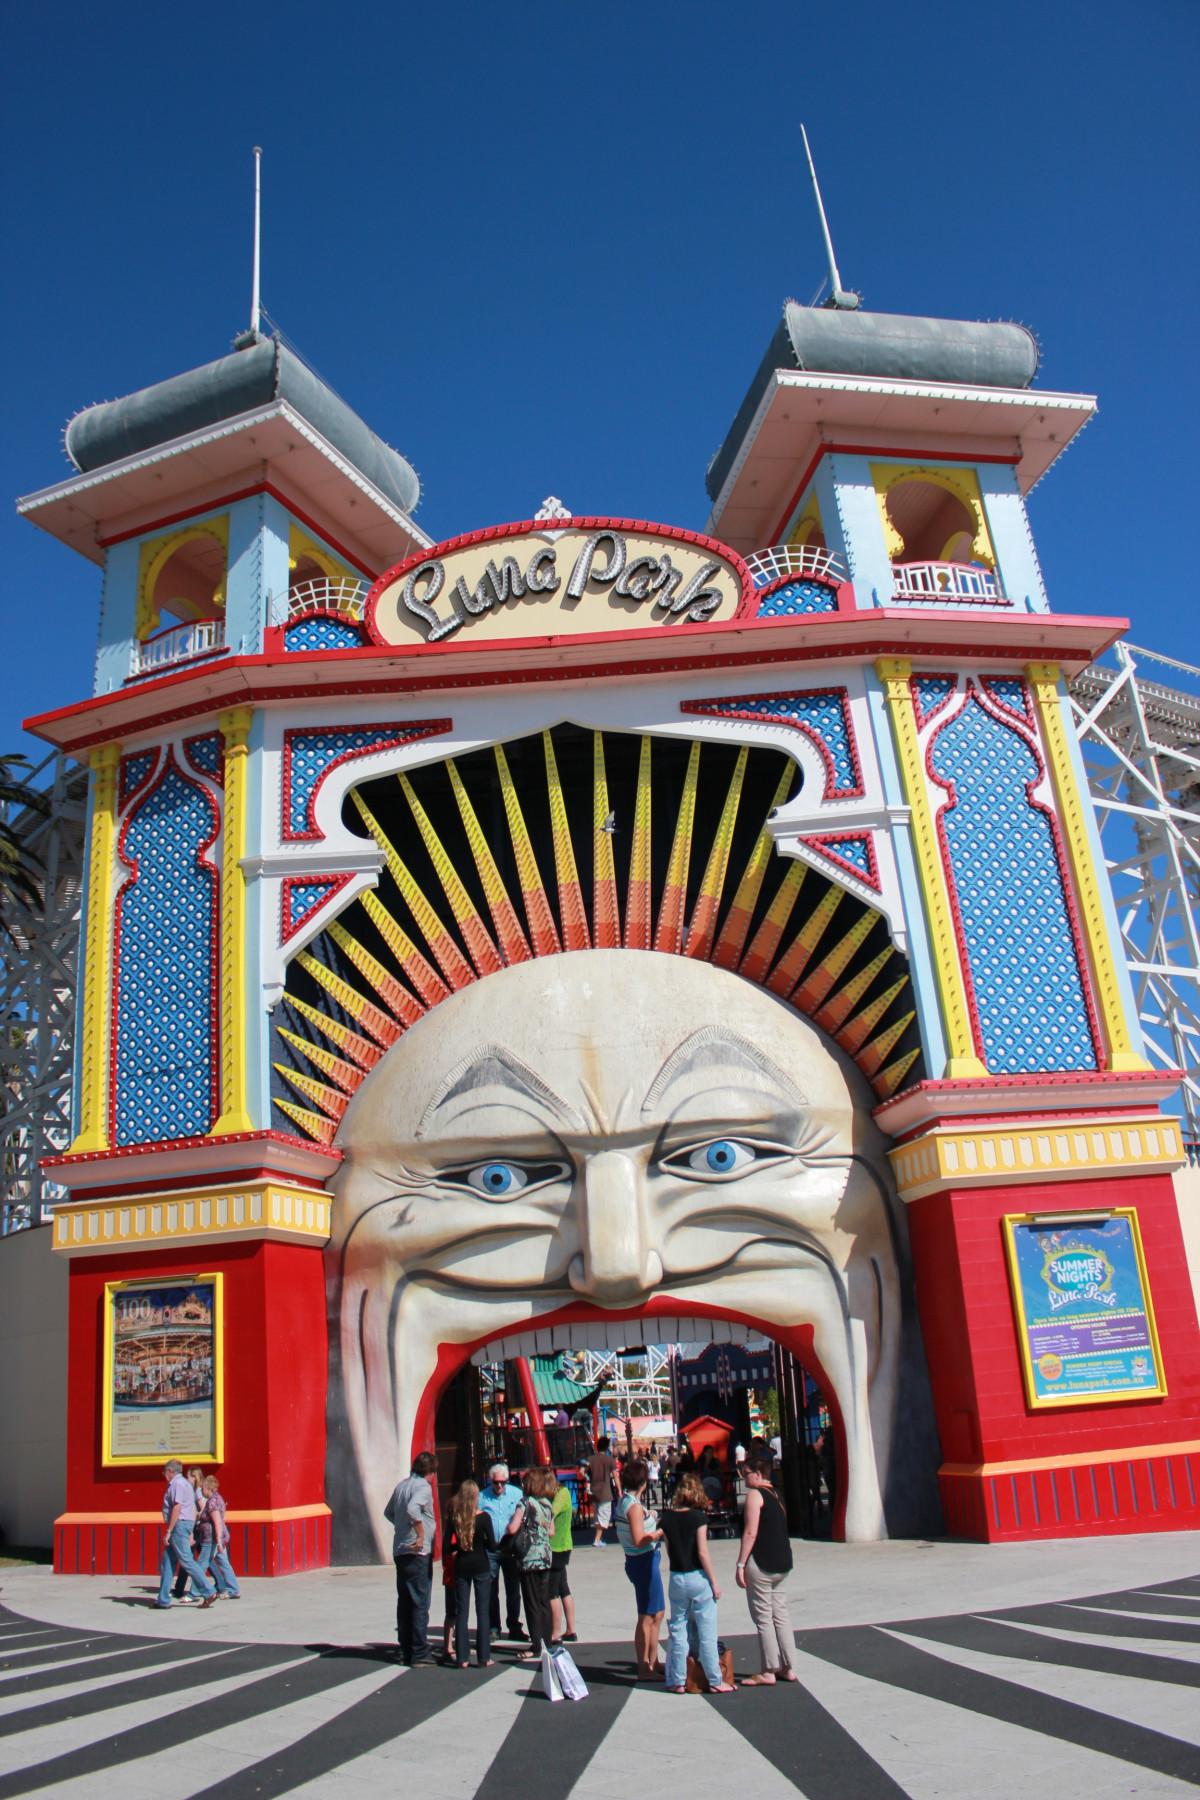 Free Images : carnival, amusement park, entrance, landmark ...